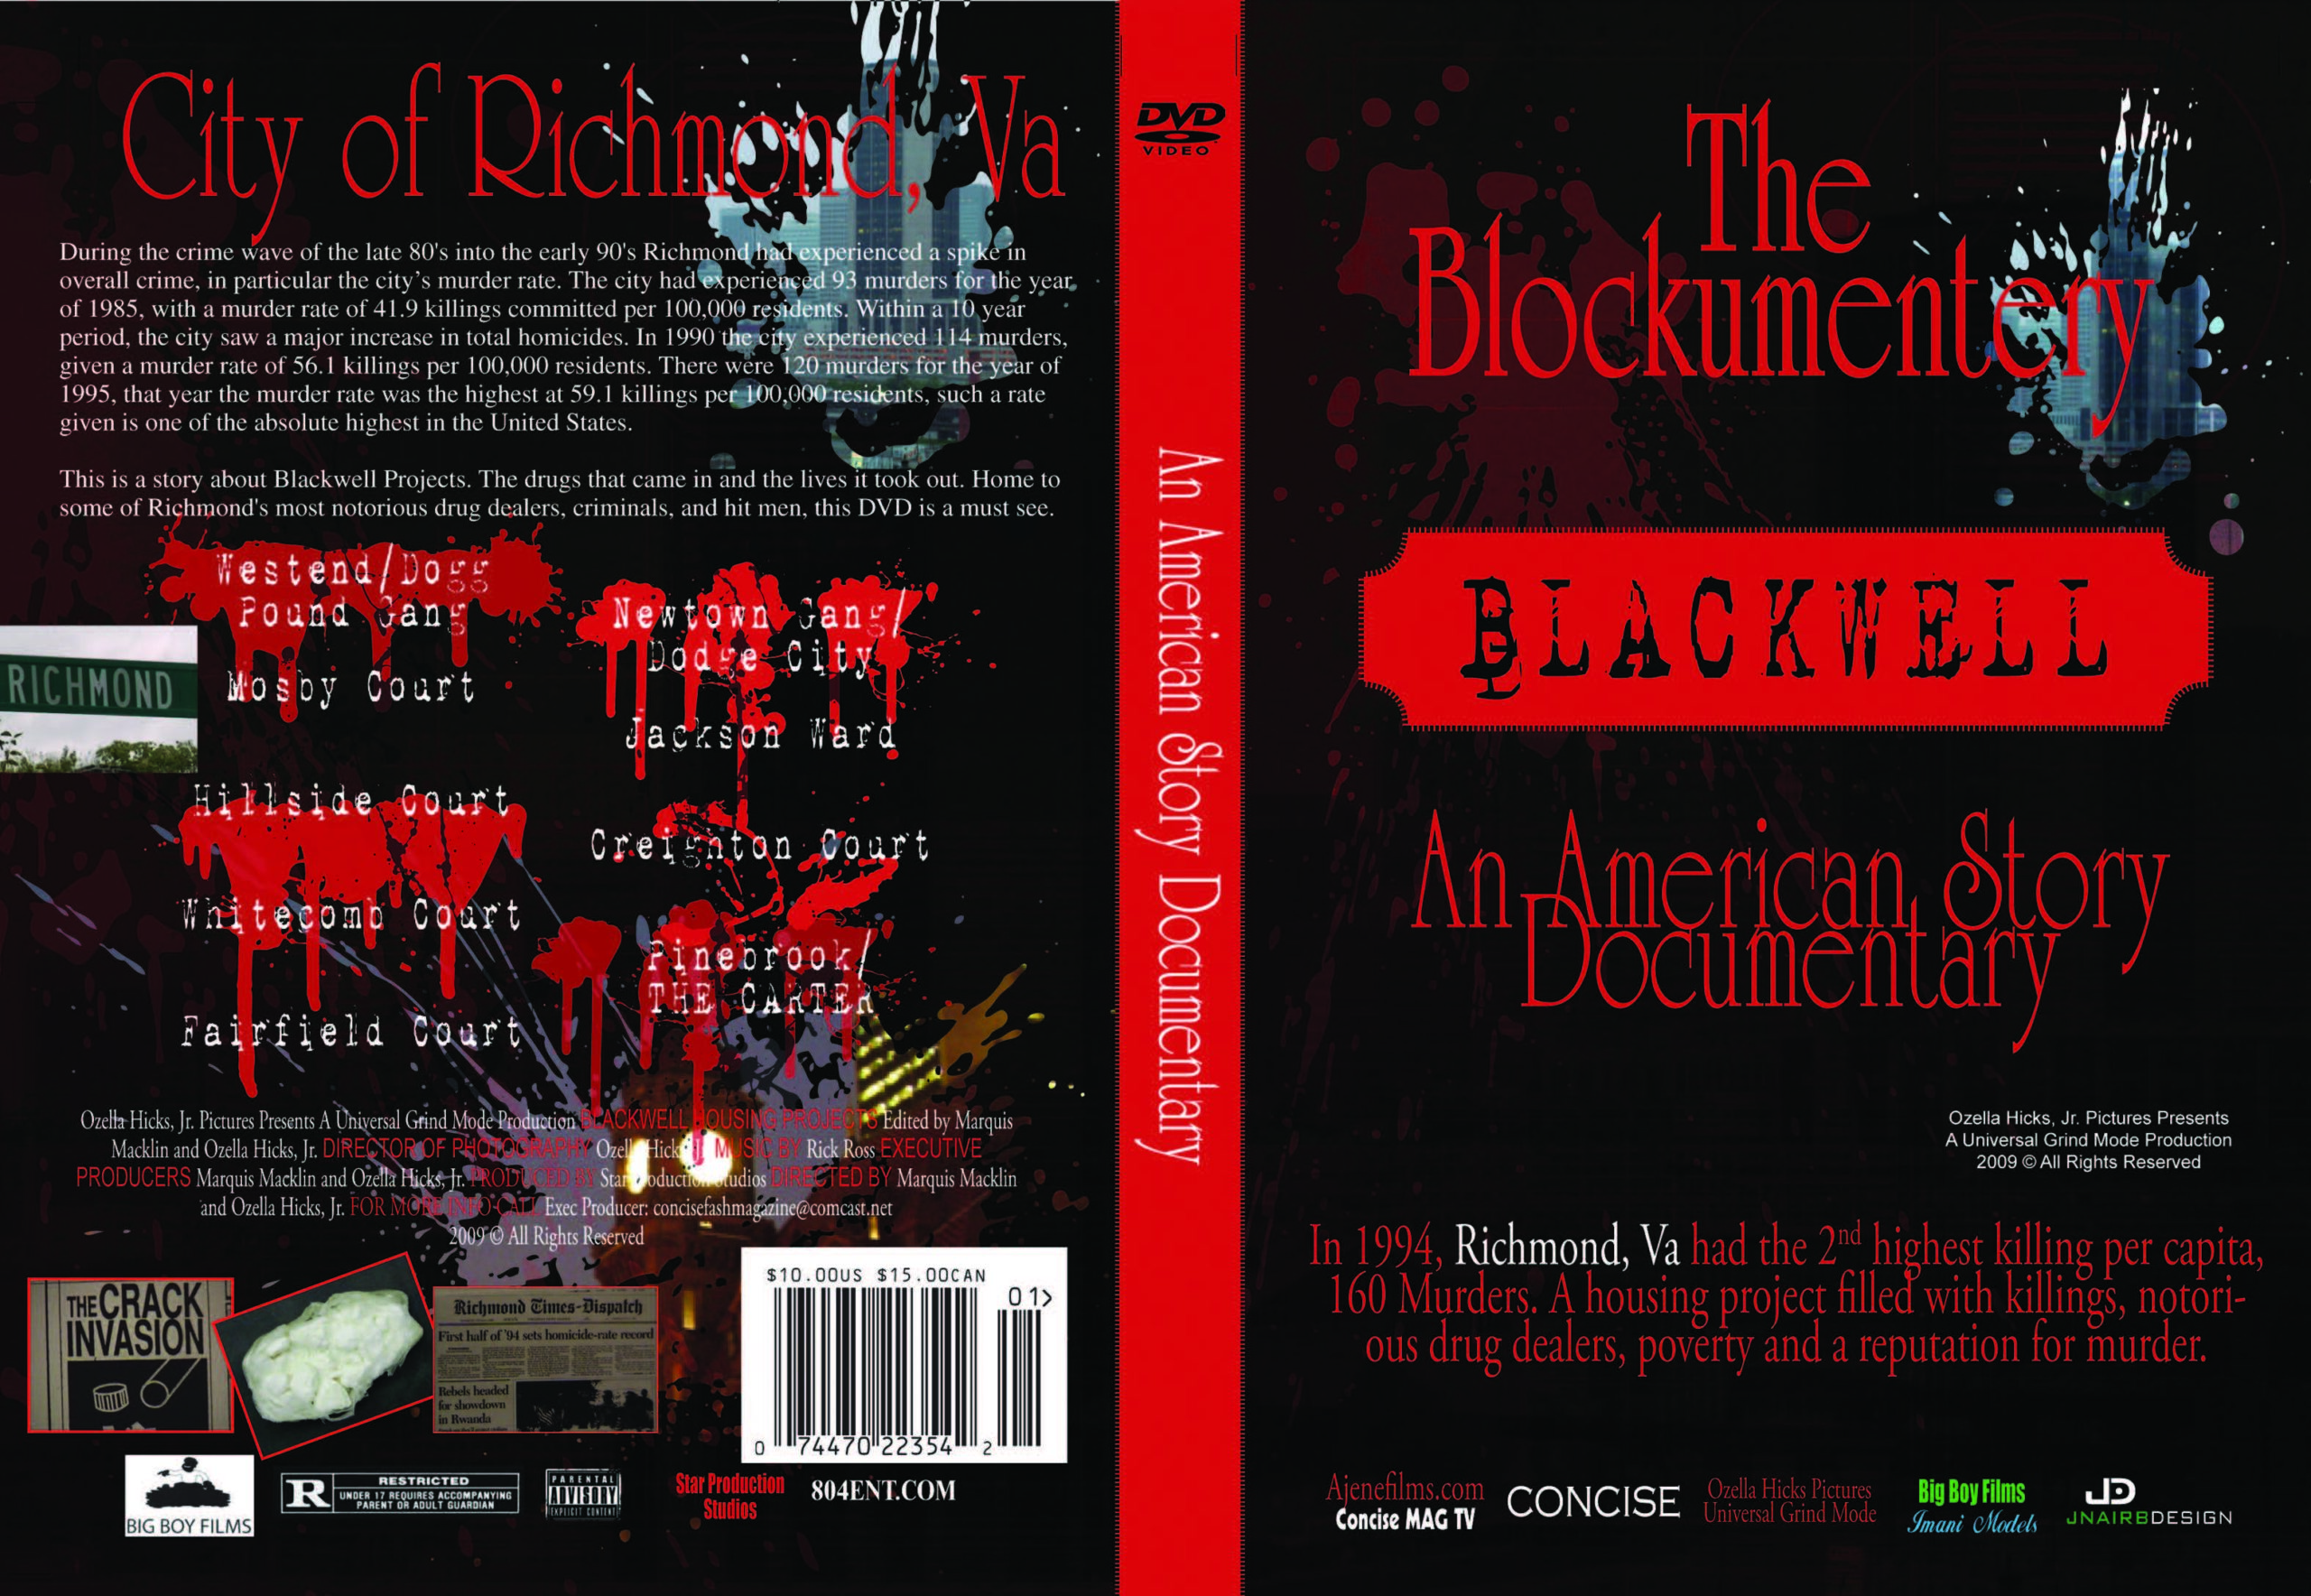 Blackwell - An American Story Documentary